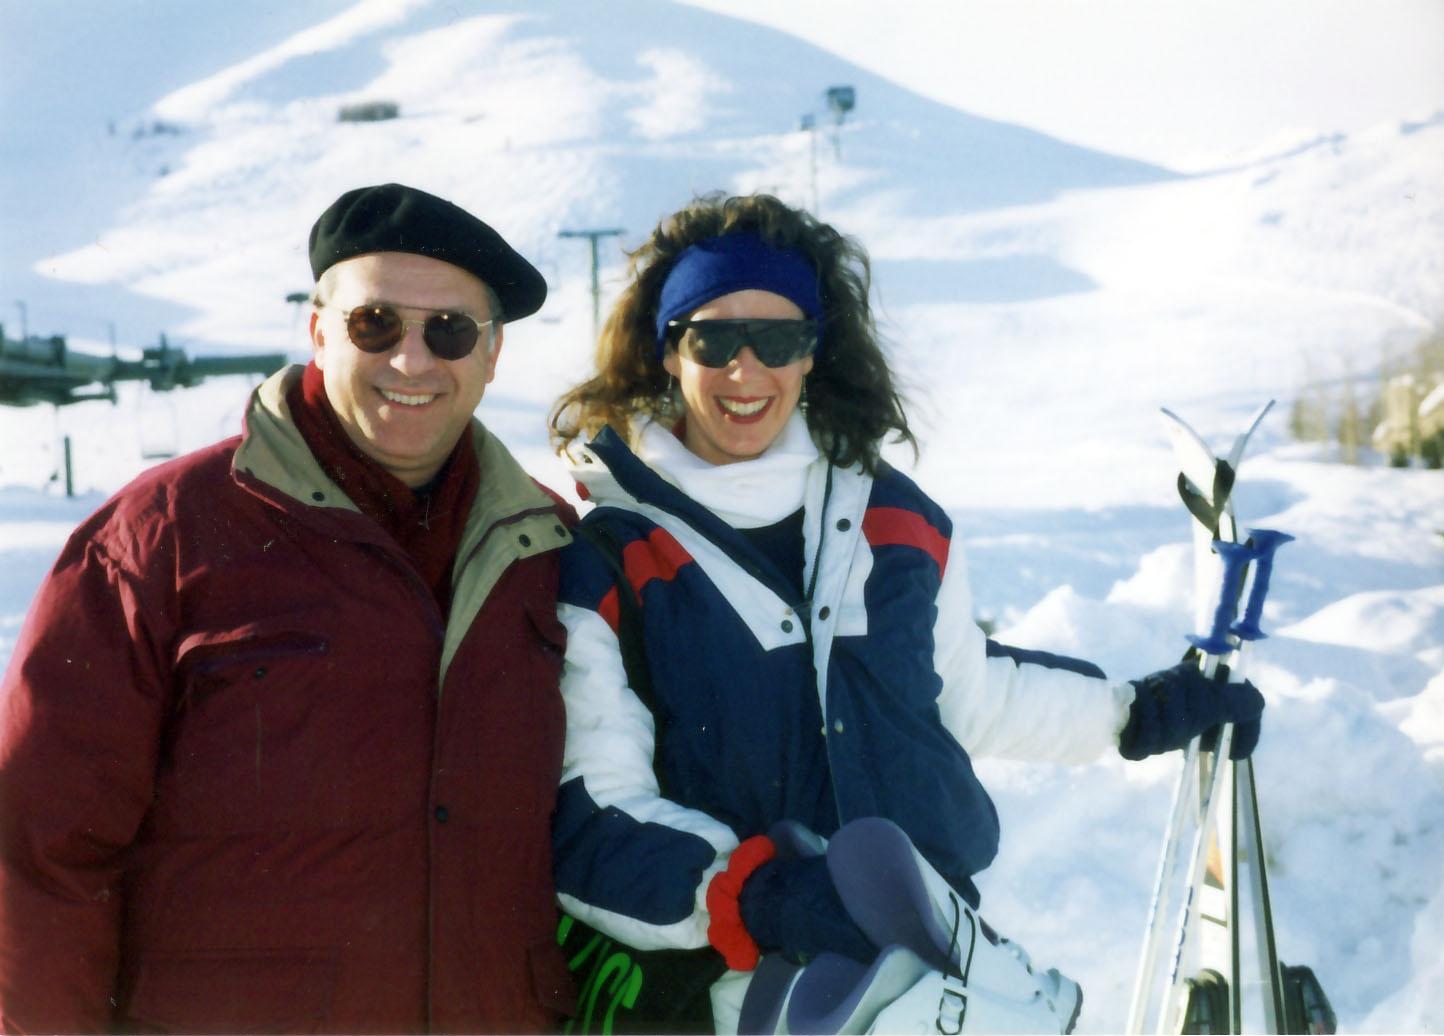 Pepe with Carissa, Sun Valley, Idaho 1995